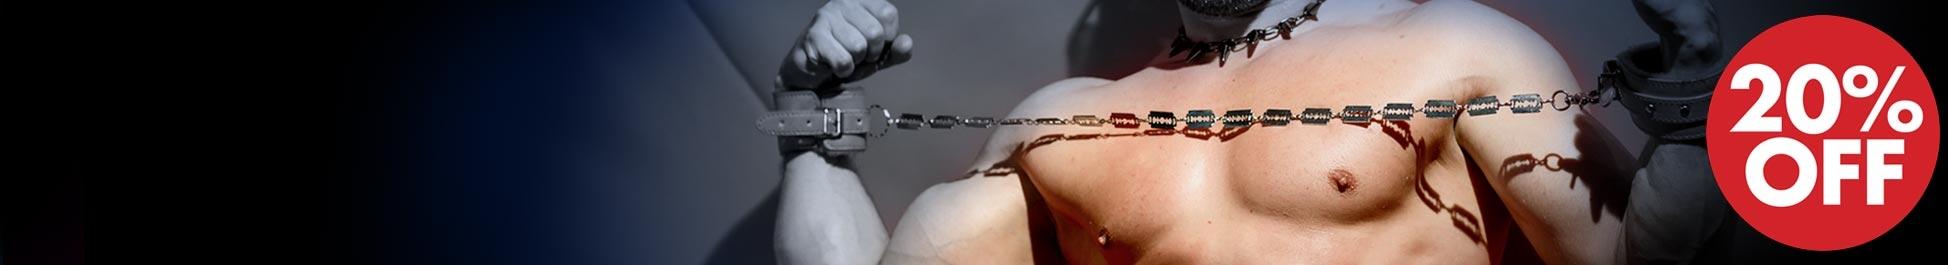 Fetish & Restraint